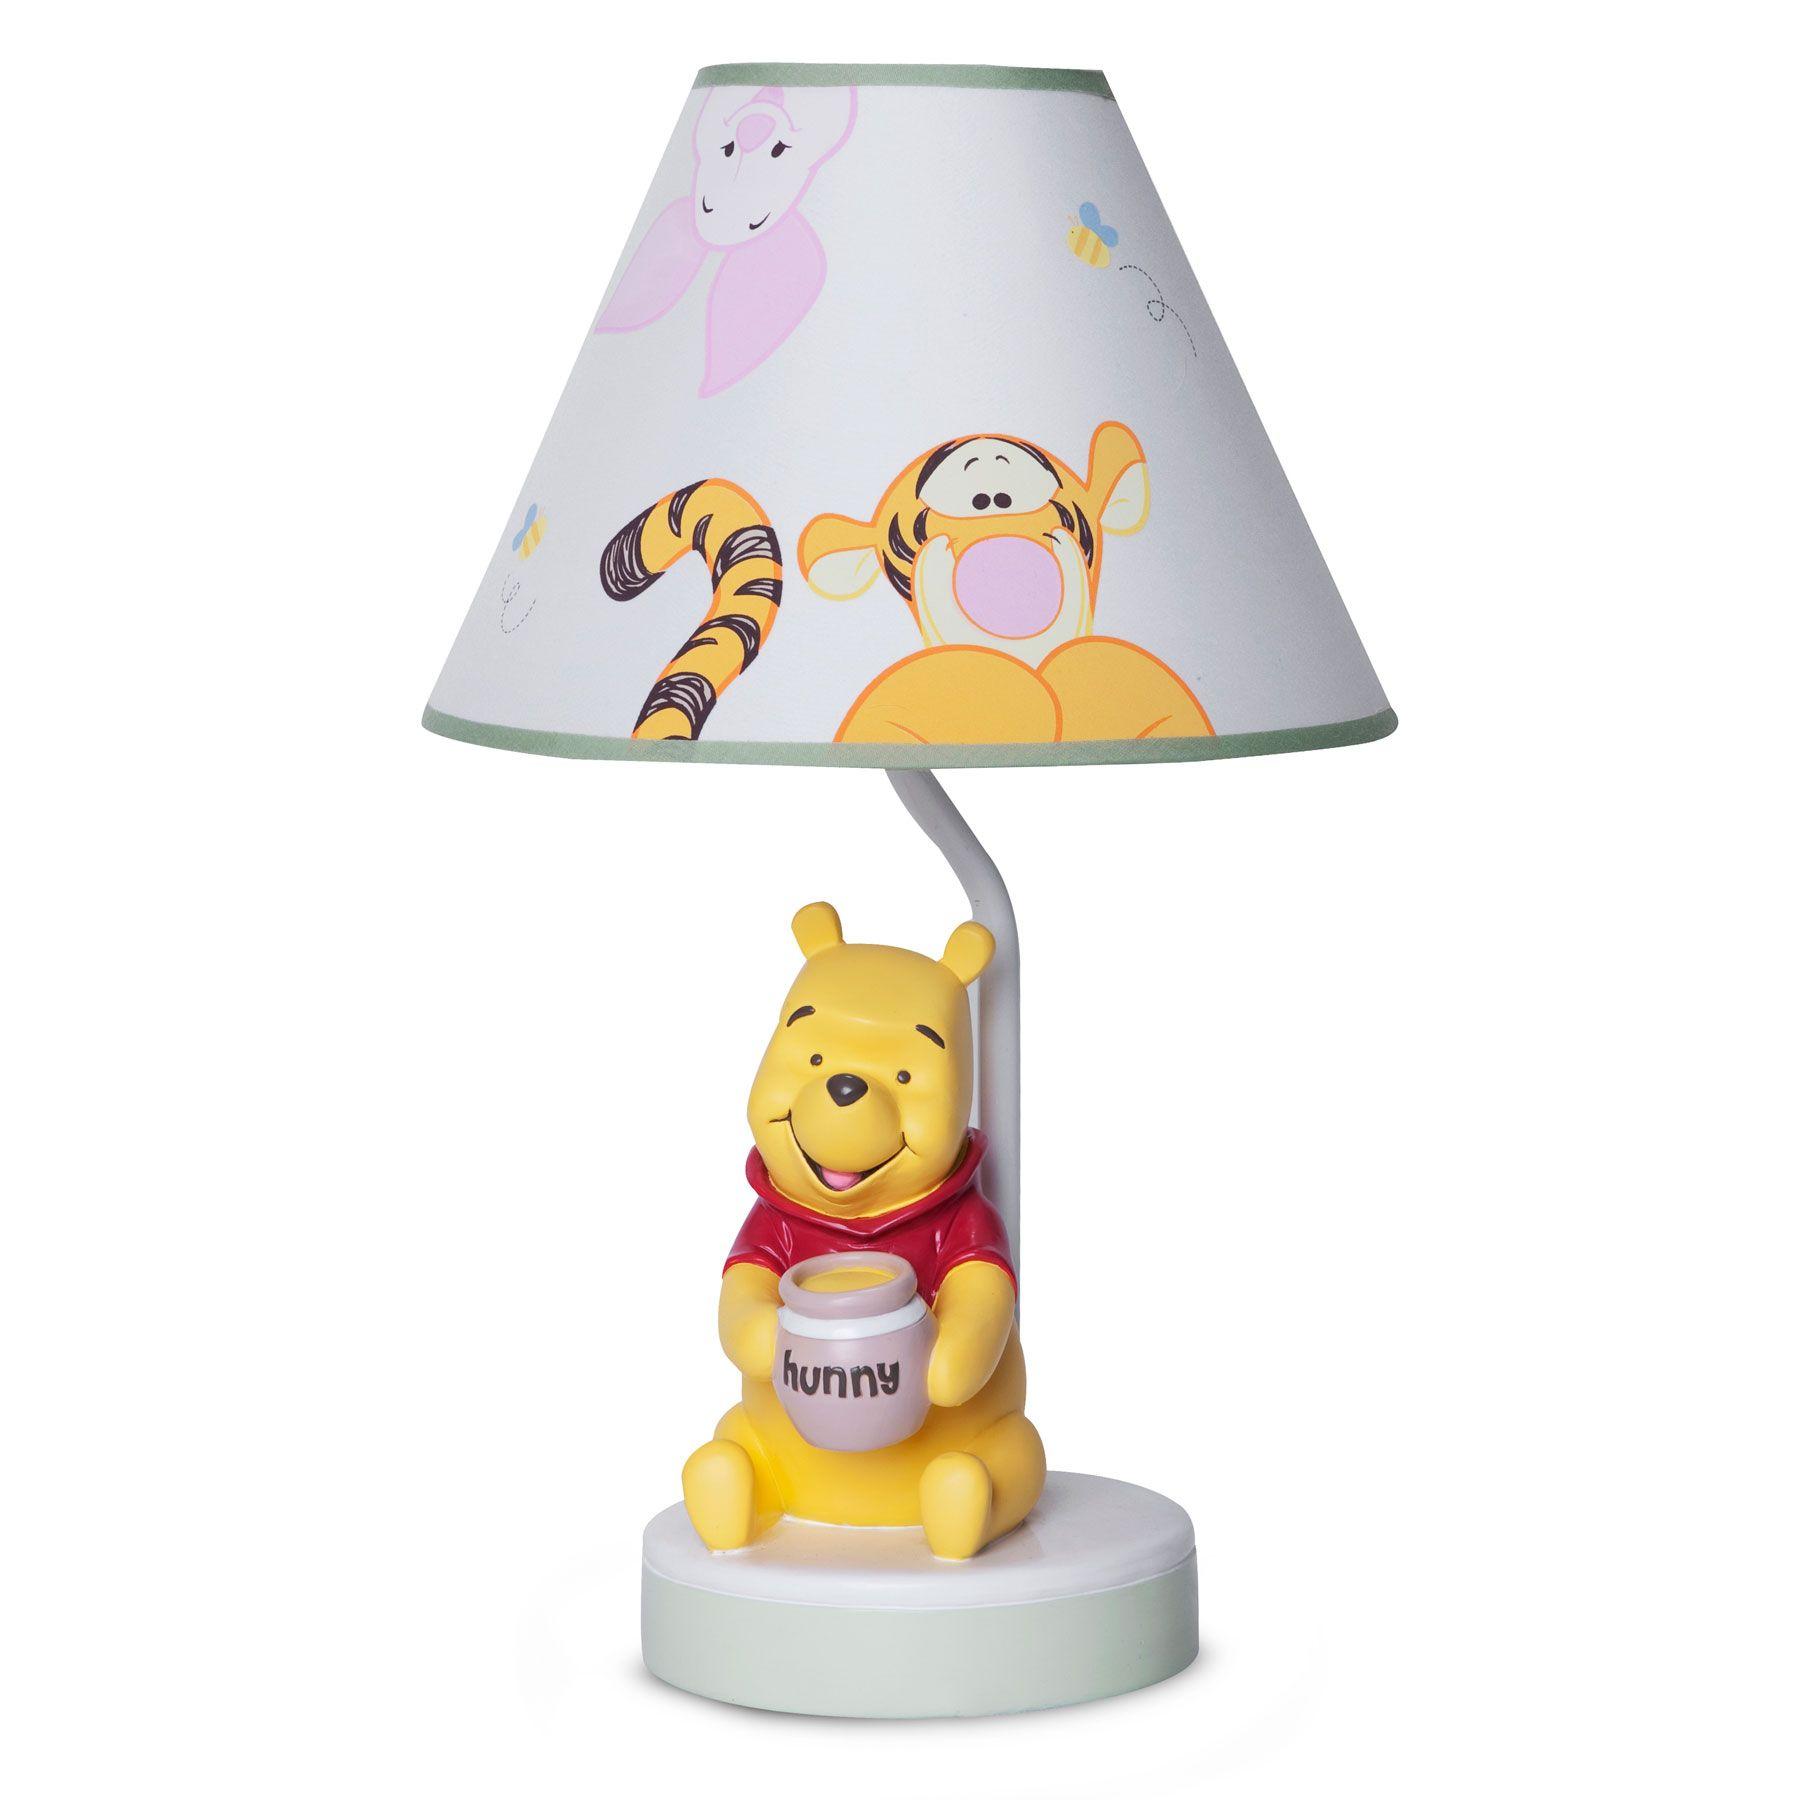 Winnie the pooh lamp and shade peeking pooh mi nia winnie the pooh lamp and shade peeking pooh aloadofball Images